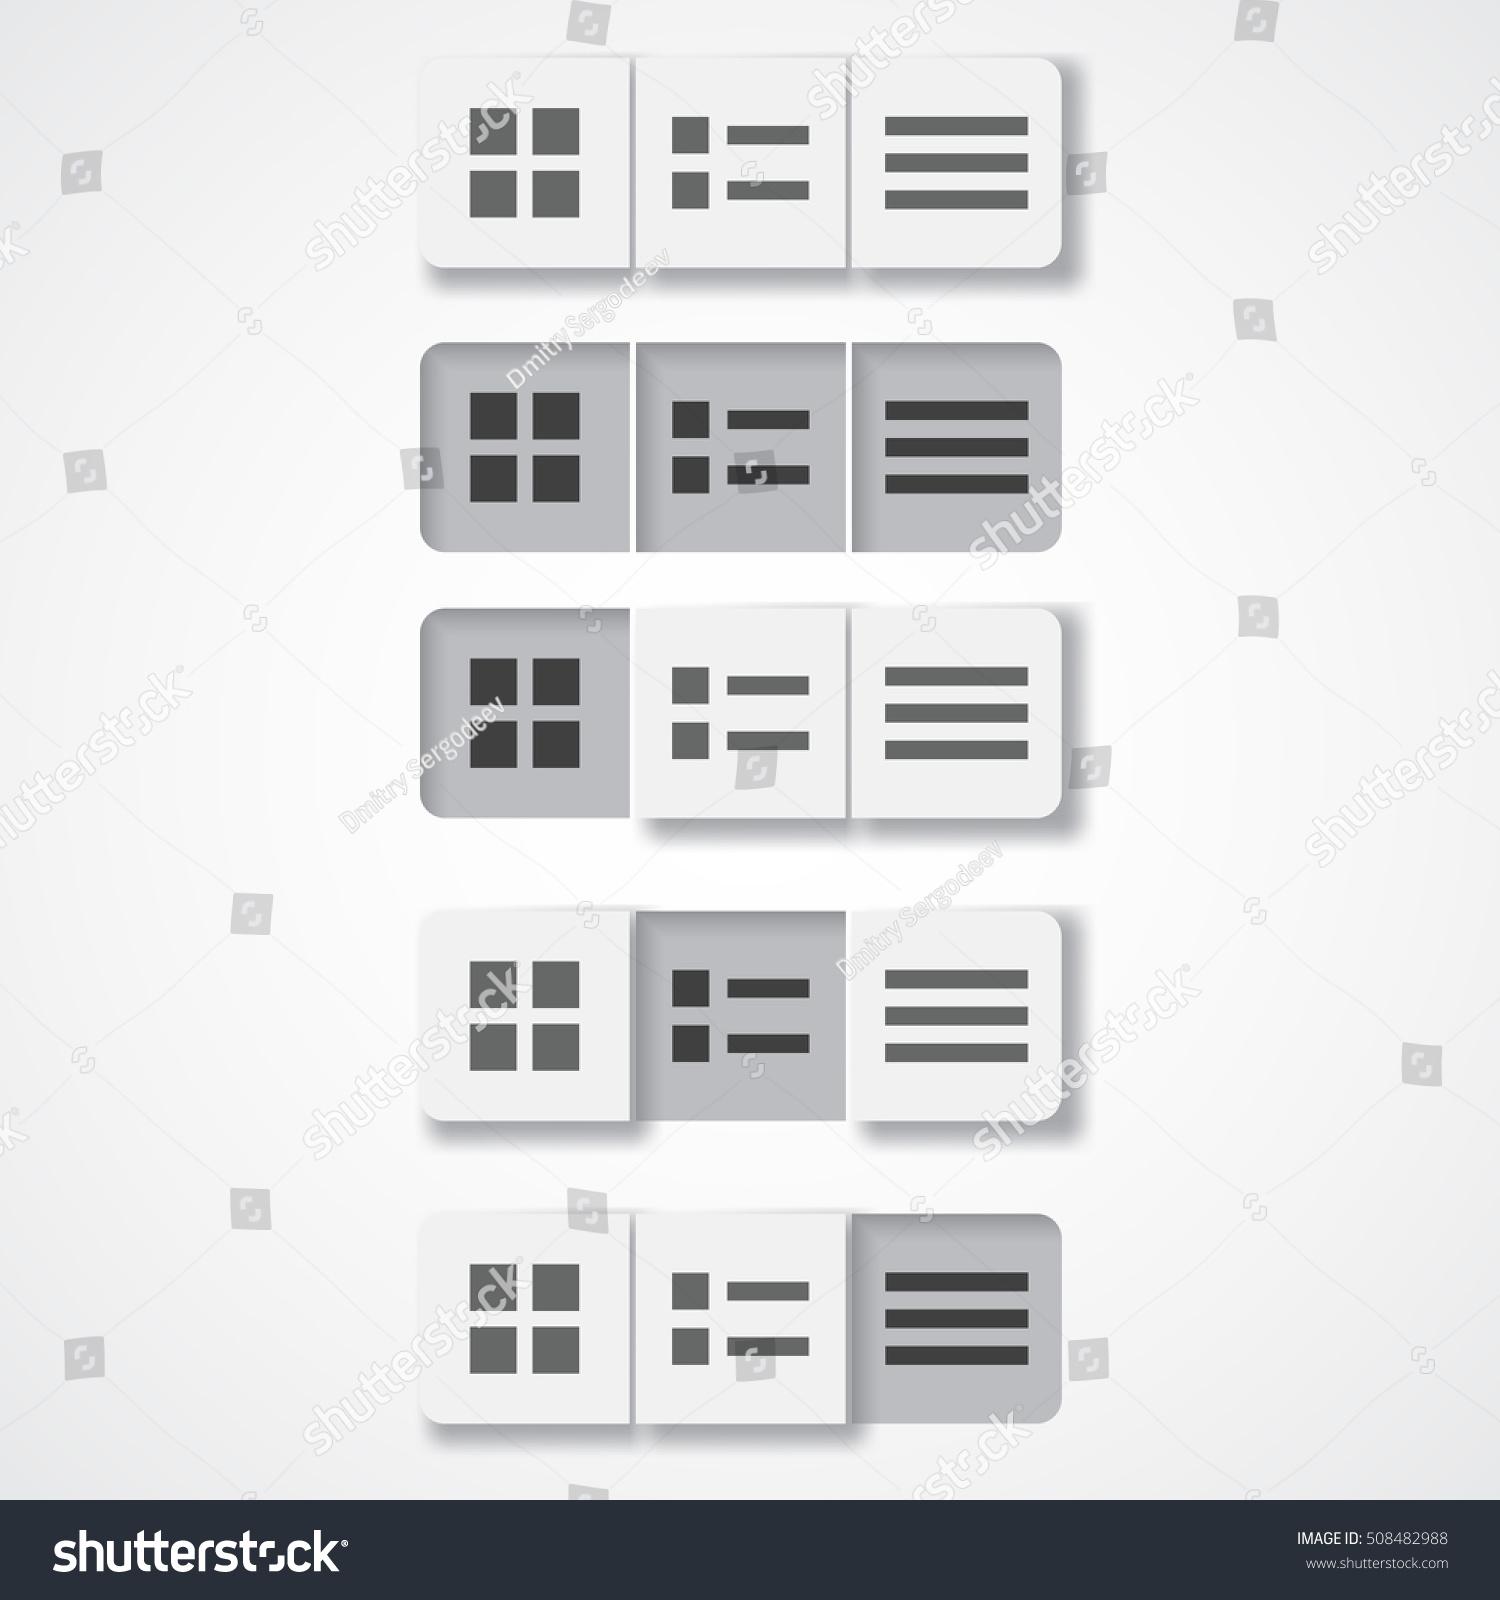 Button List Display Mode Change Stock Vector 508482988 - Shutterstock